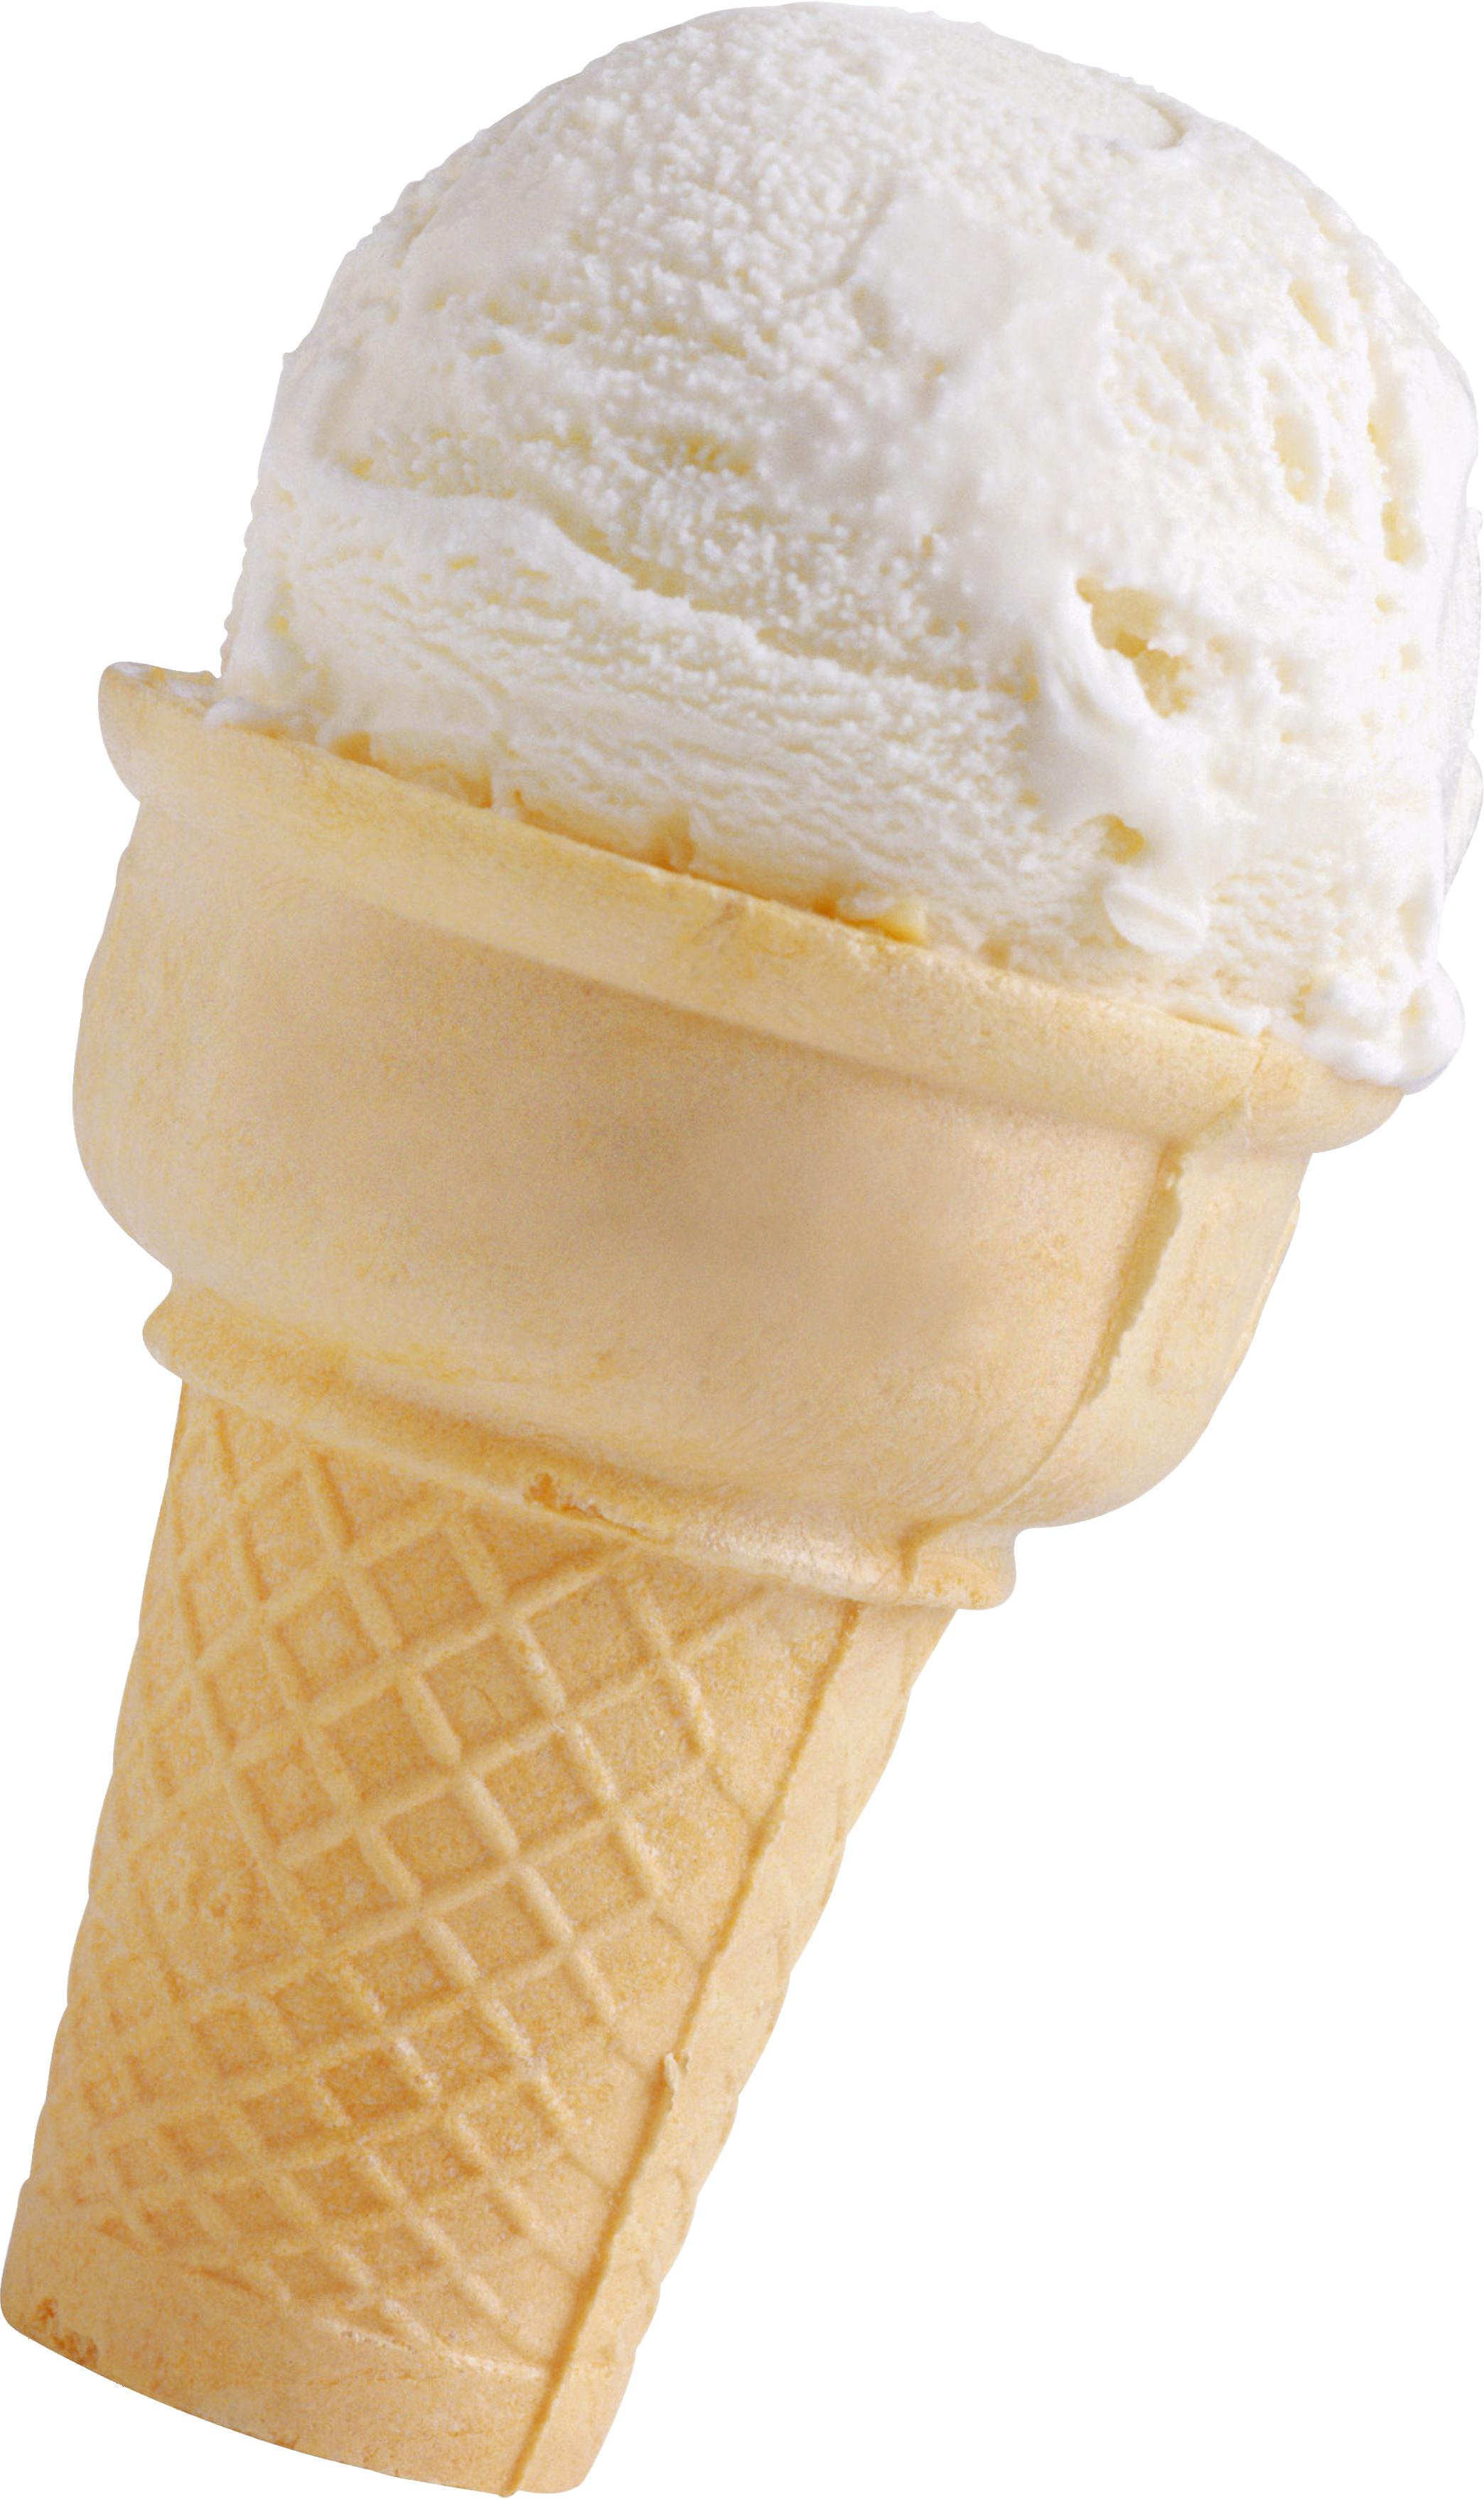 Ice cream png image. Icecream clipart eight